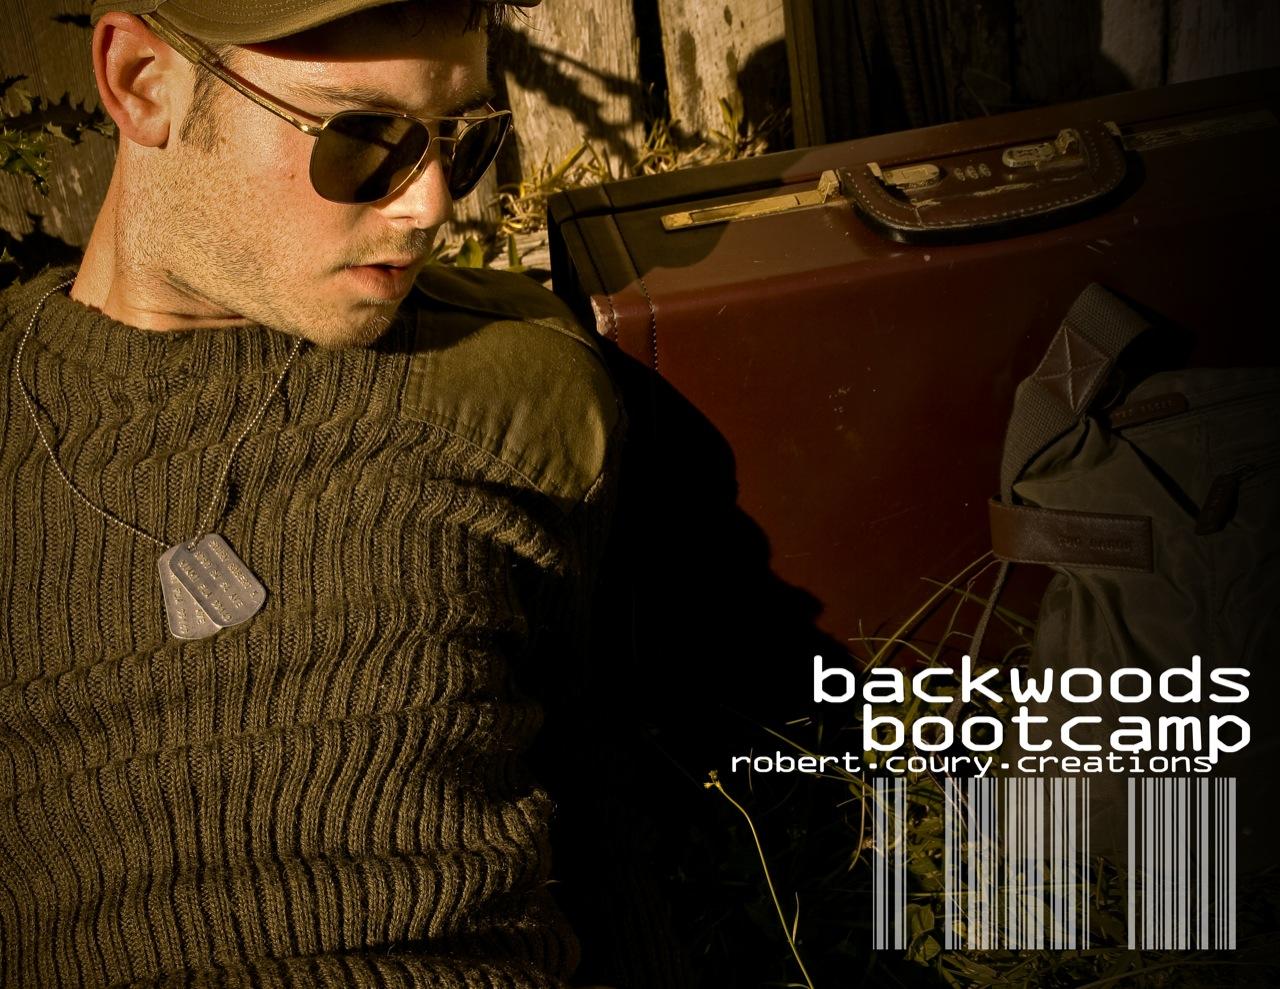 Backwoods Bootcamp - 000.jpg